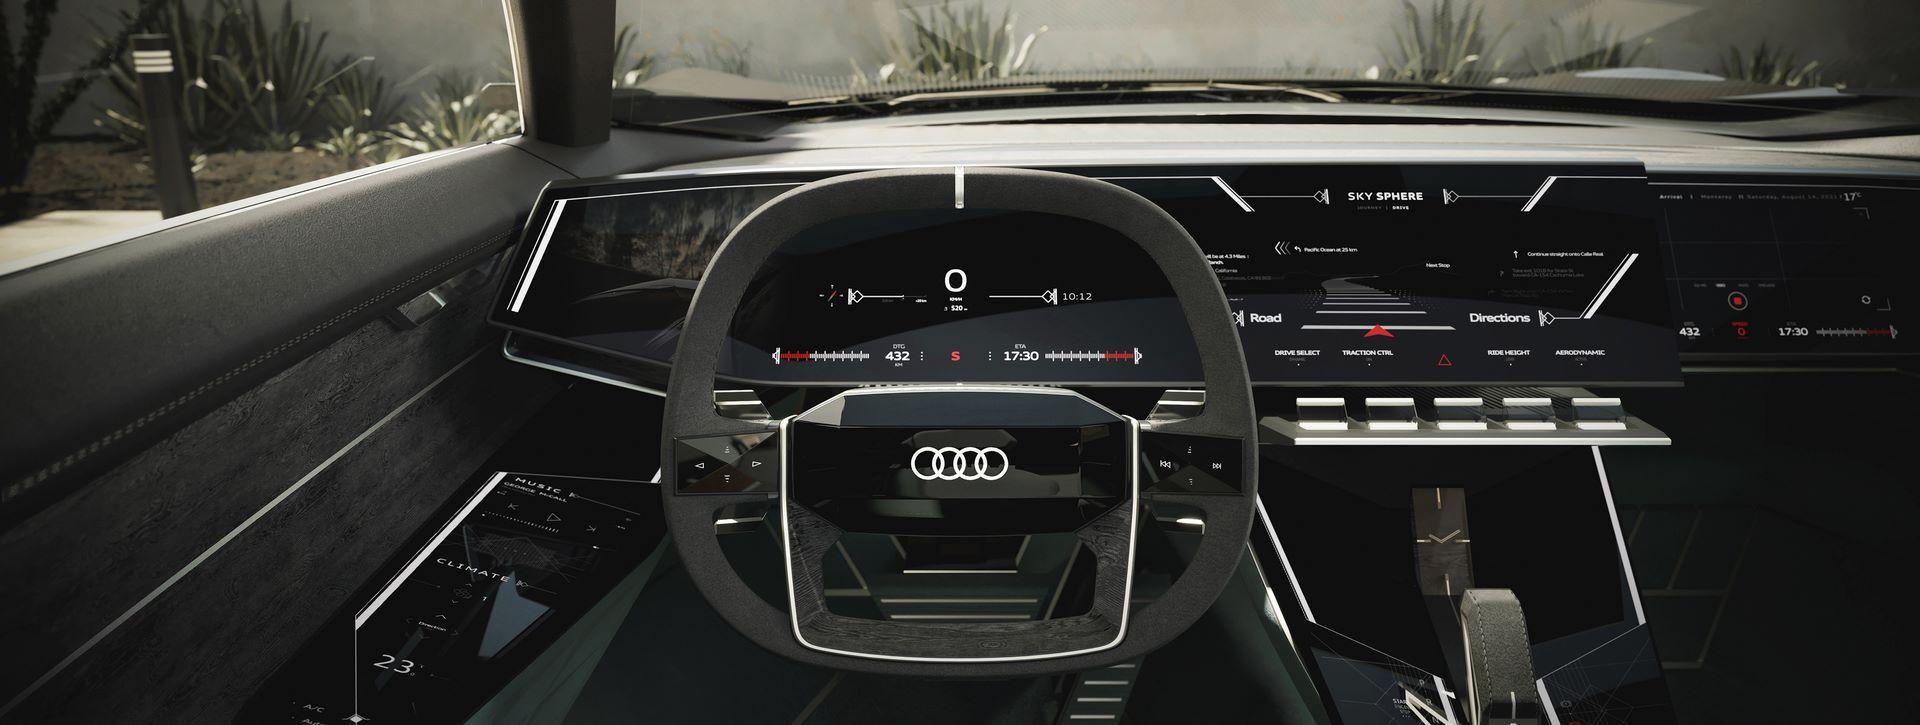 Audi-Skysphere-Concept-24